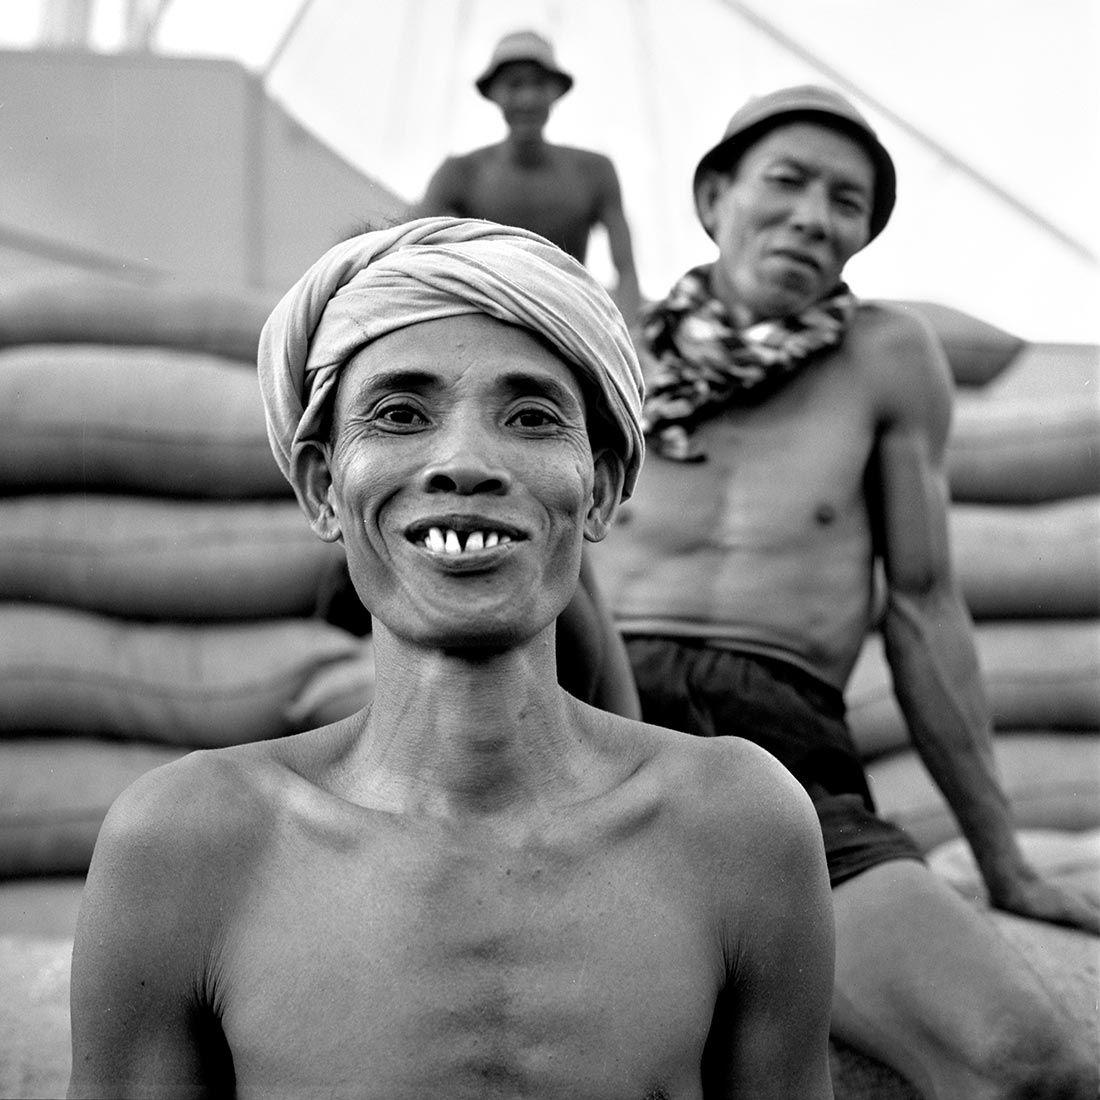 Street Photography 3 | Vivian Maier Photographer. 1959. Saigon, Vietnam.